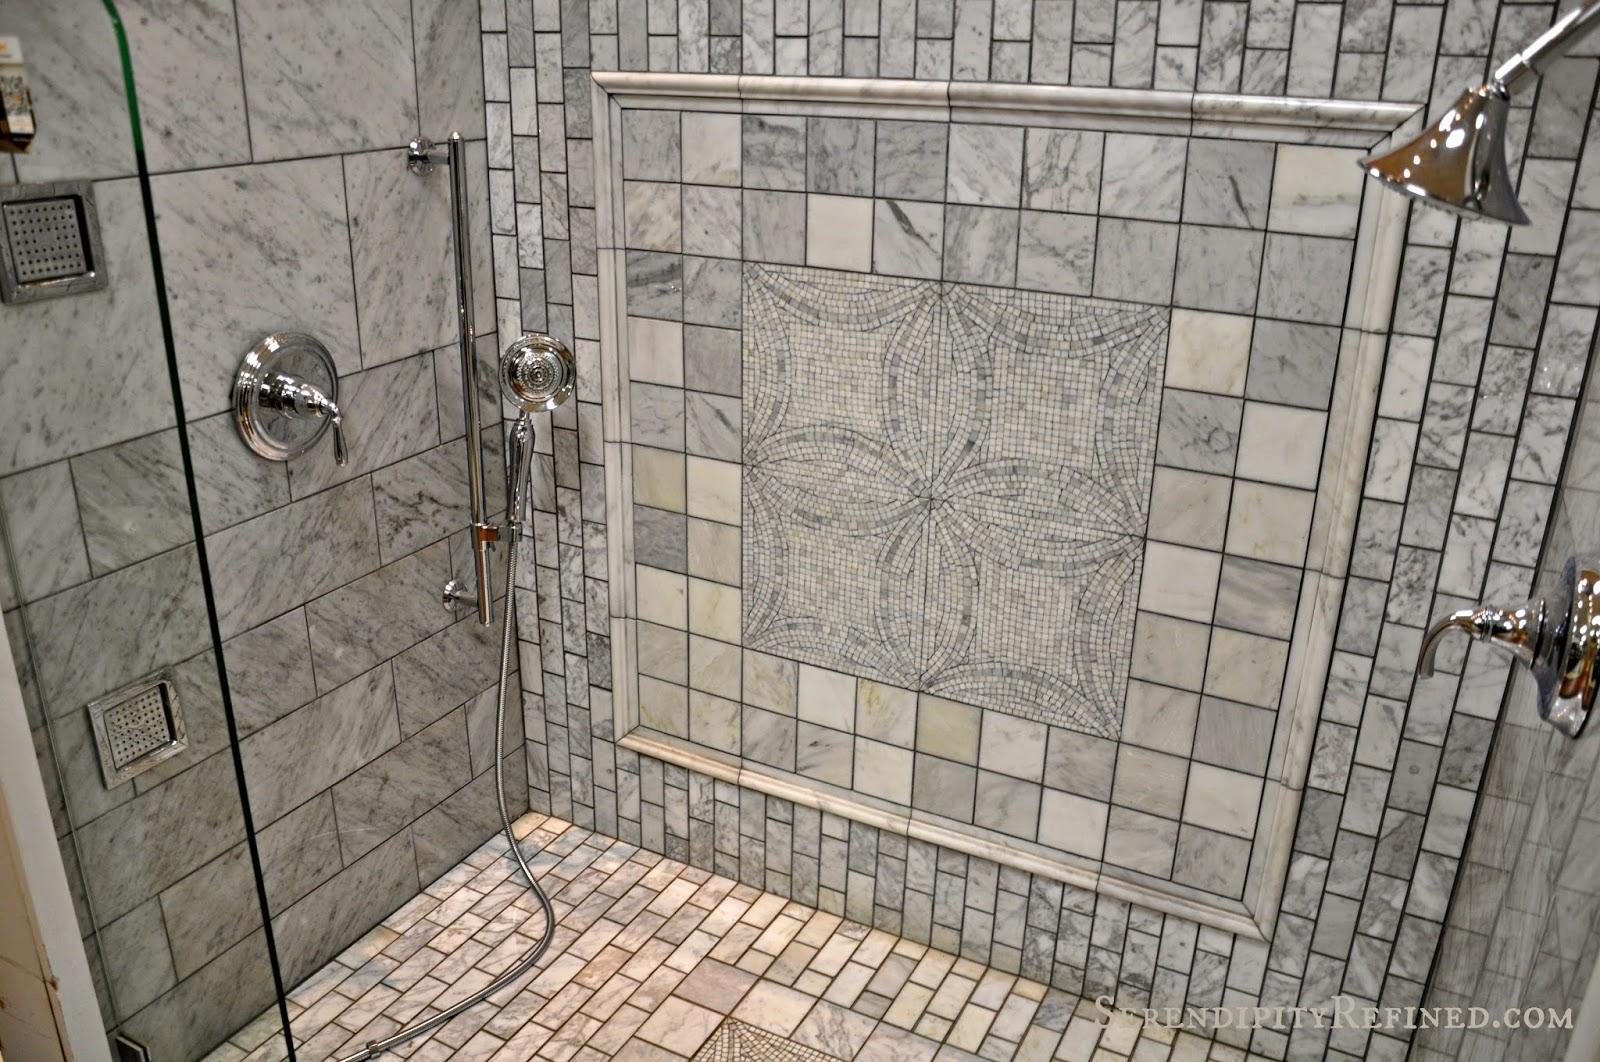 Choosing Bathroom Tile Serendipity Refined Blog Choosing Kitchen And Bathroom Tile